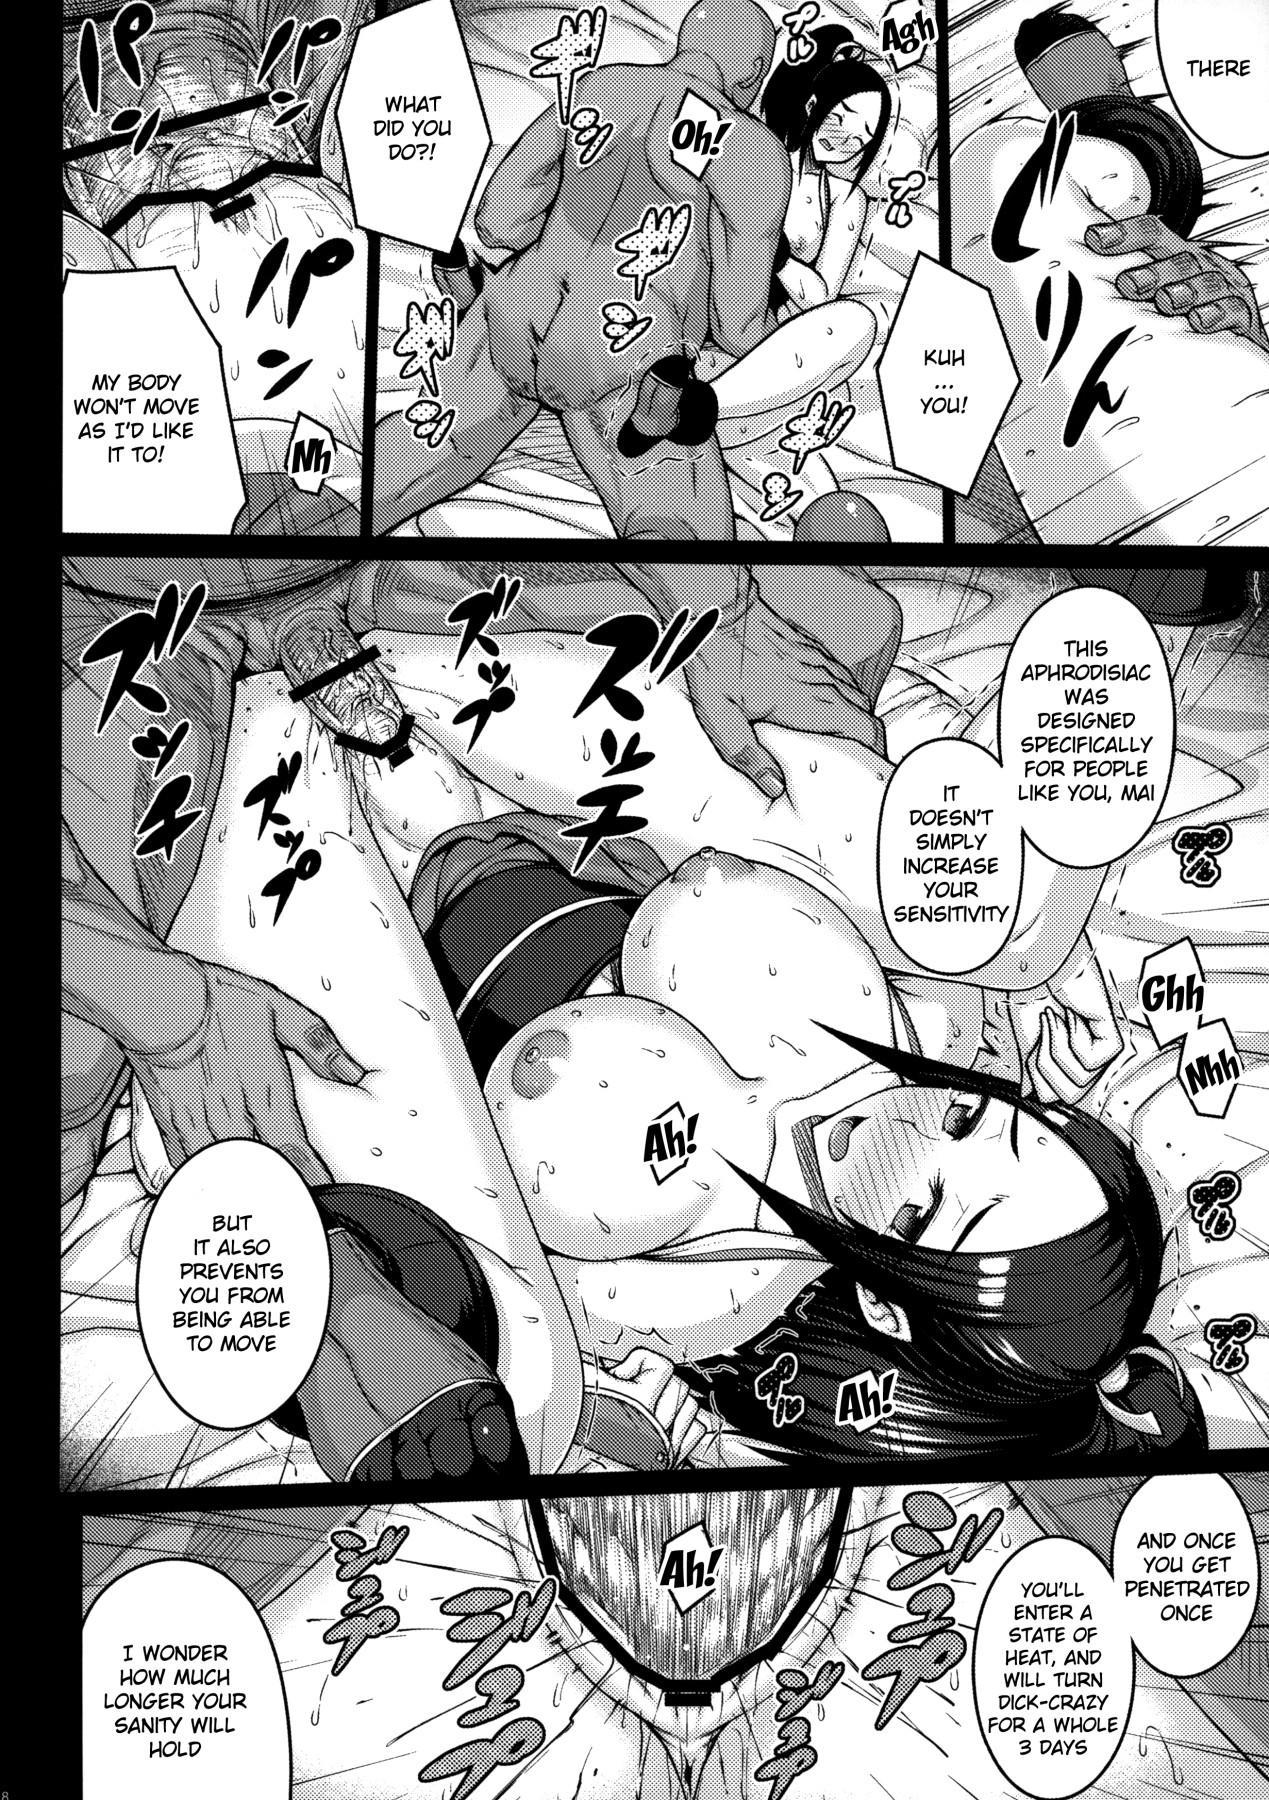 Daraku no hana | Flower of depravity 16